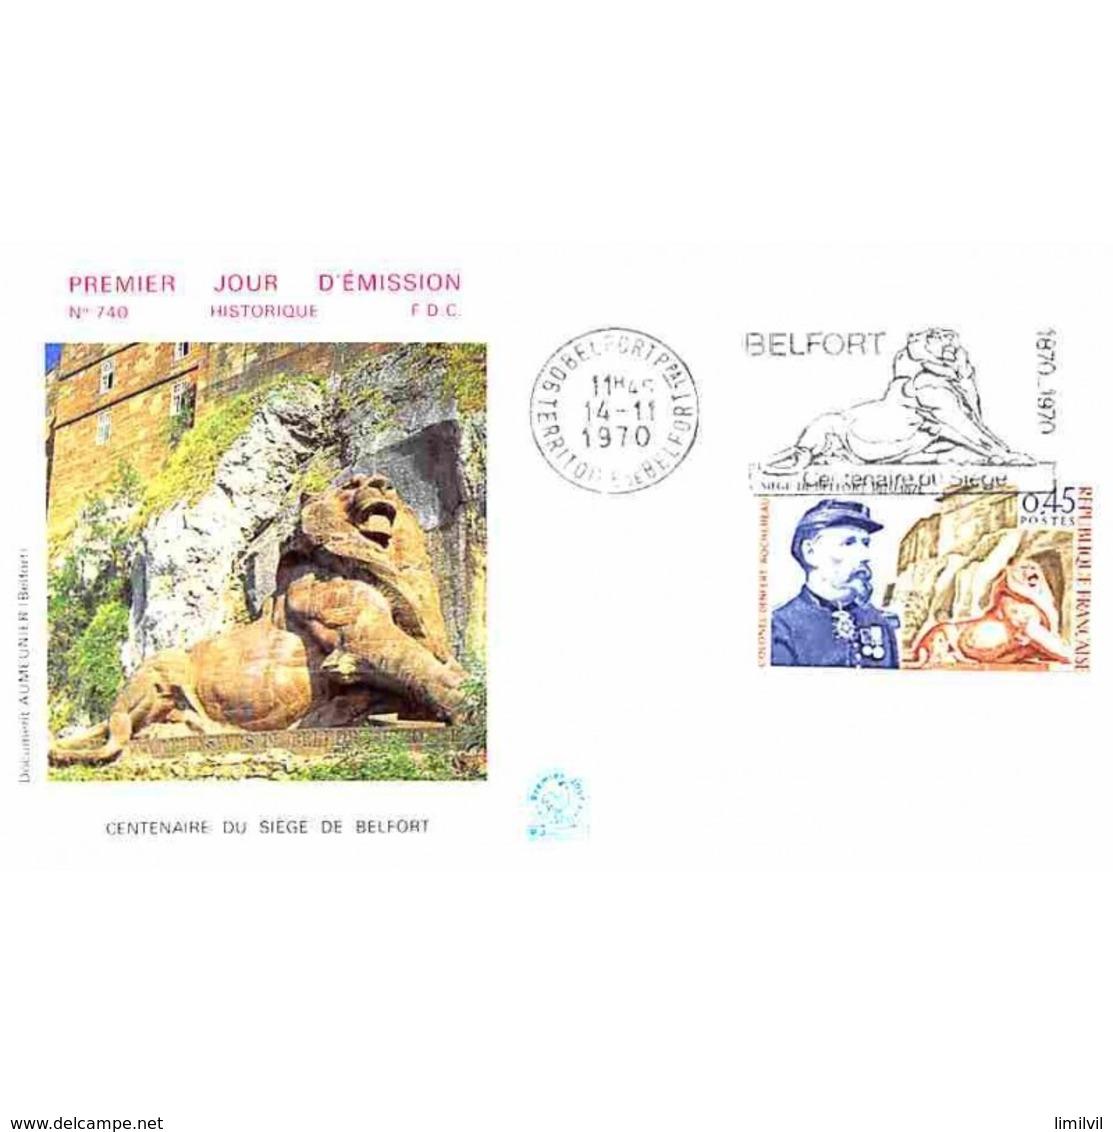 FDC - Centenaire Du Siège De Belfort En 1870 - 14/11/1970 Belfort - 1970-1979